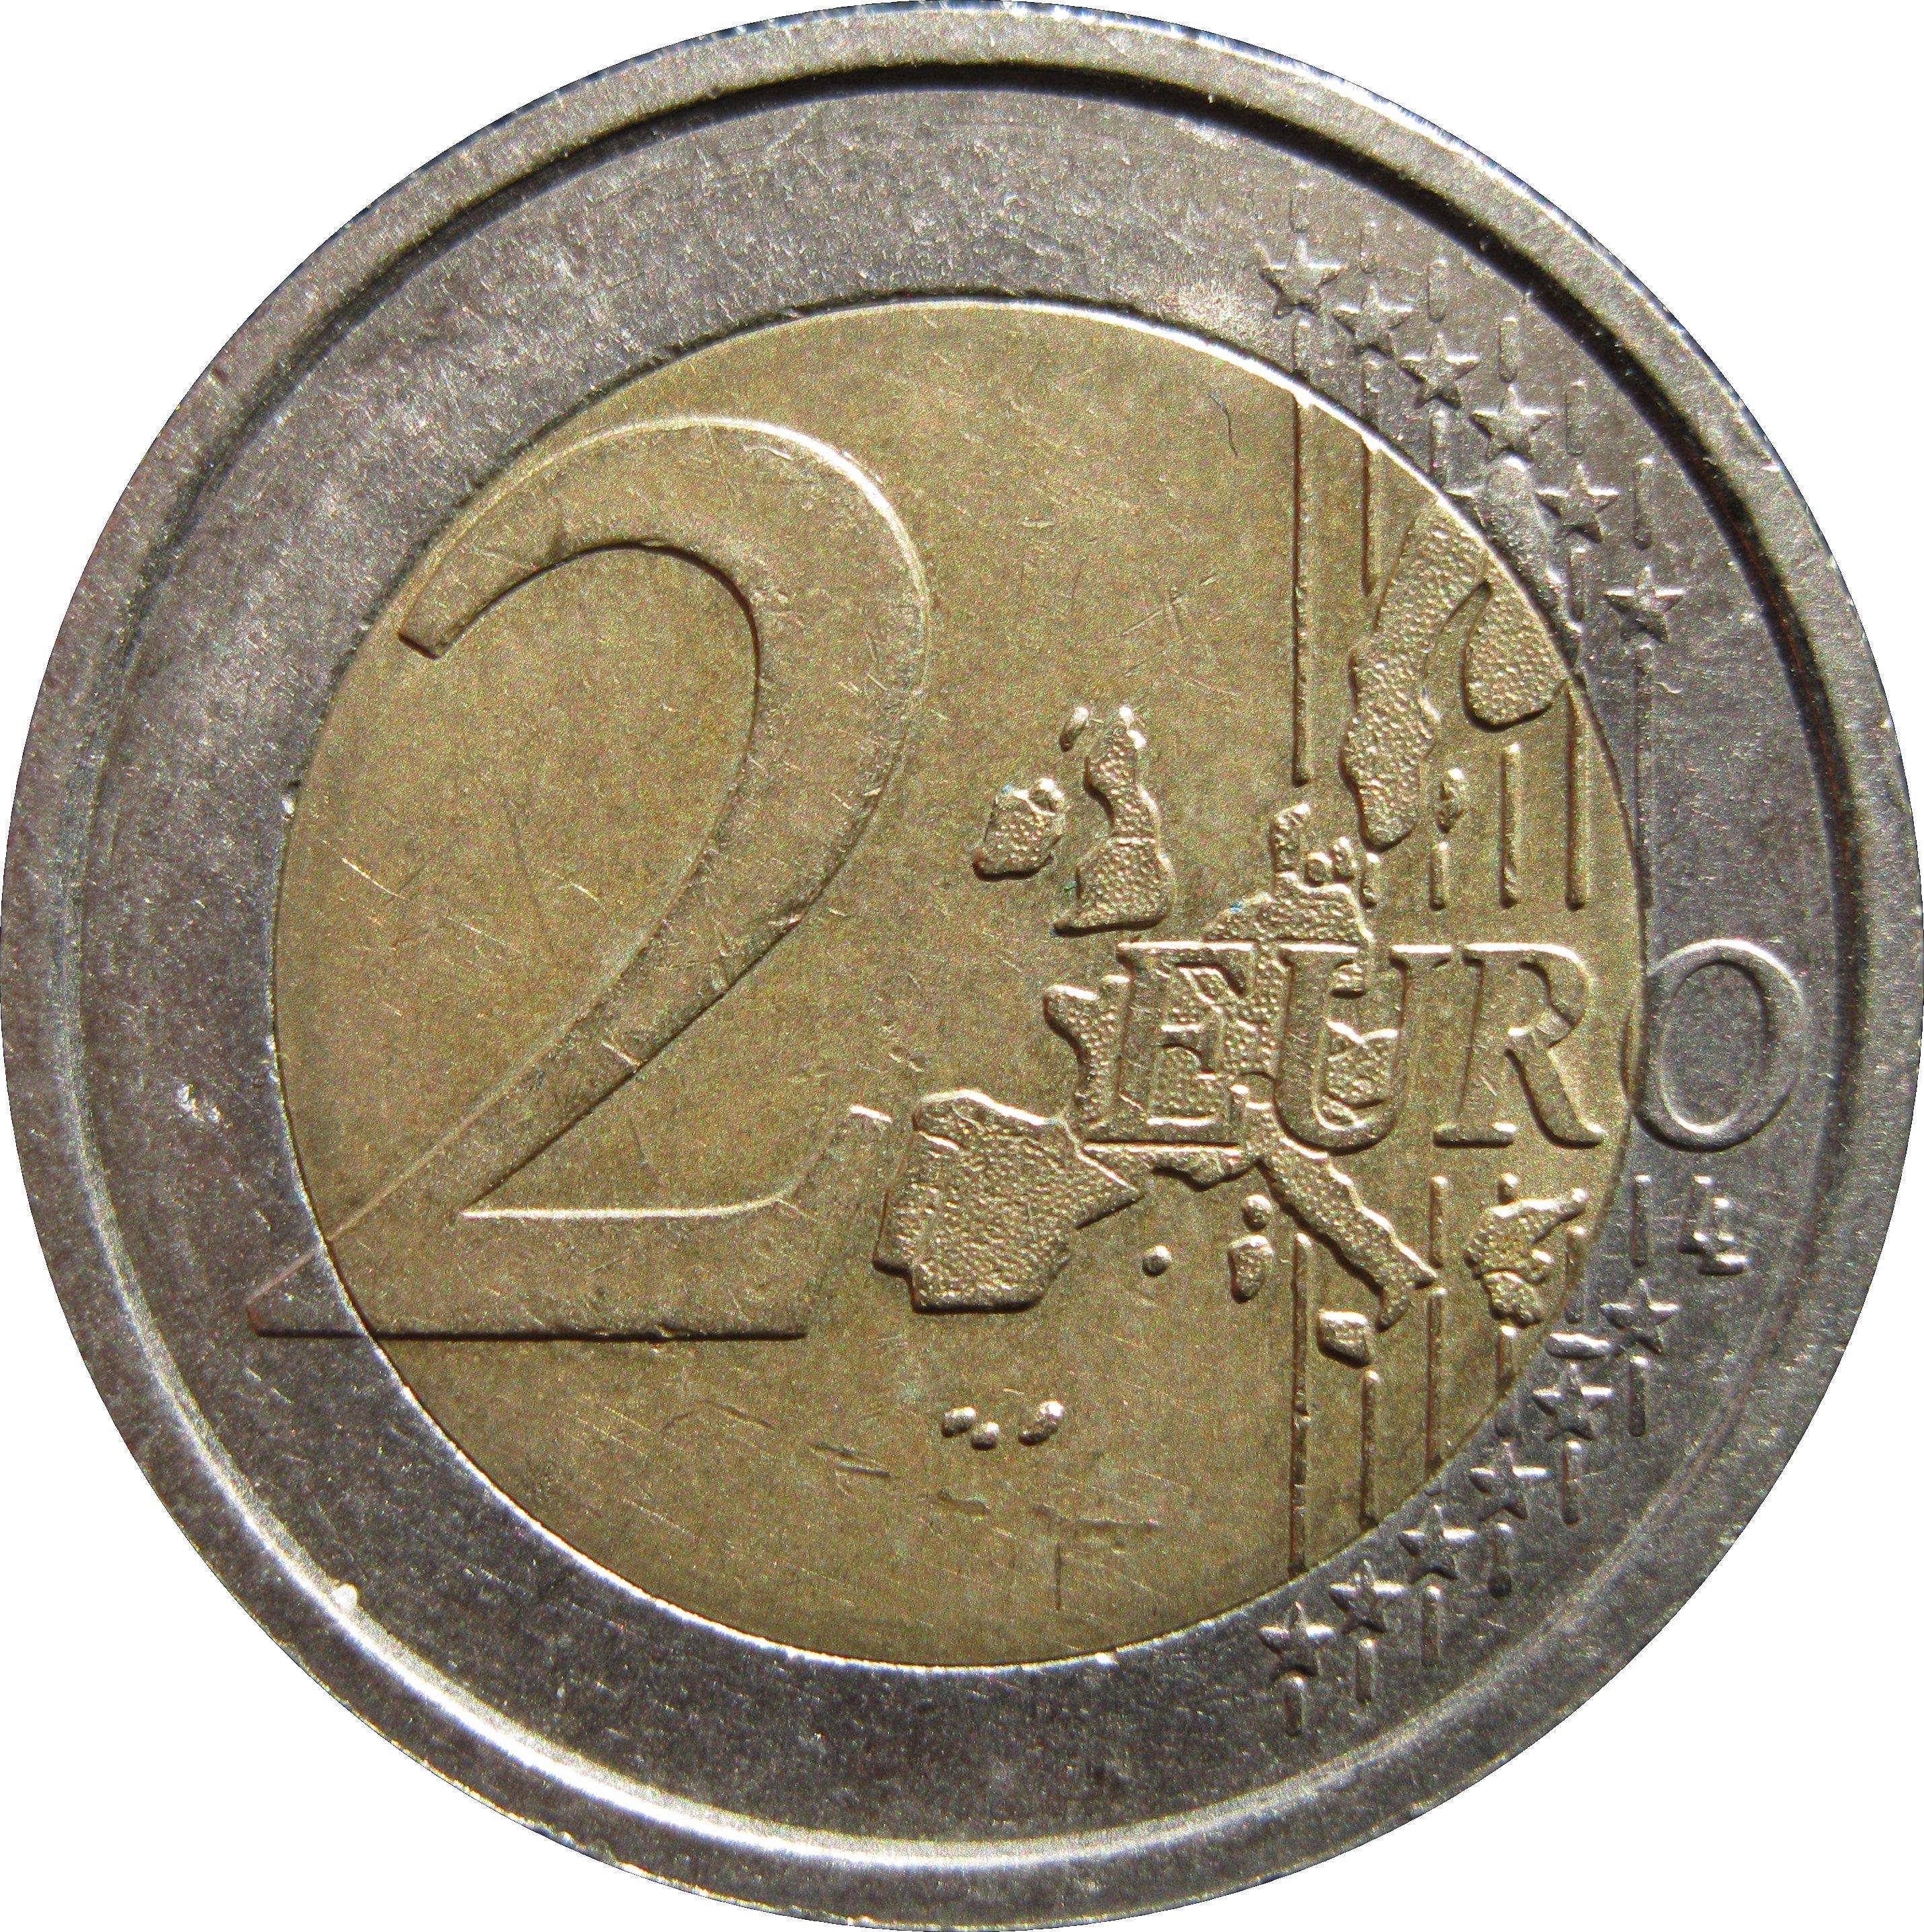 2 euros constitution europ enne italie numista. Black Bedroom Furniture Sets. Home Design Ideas